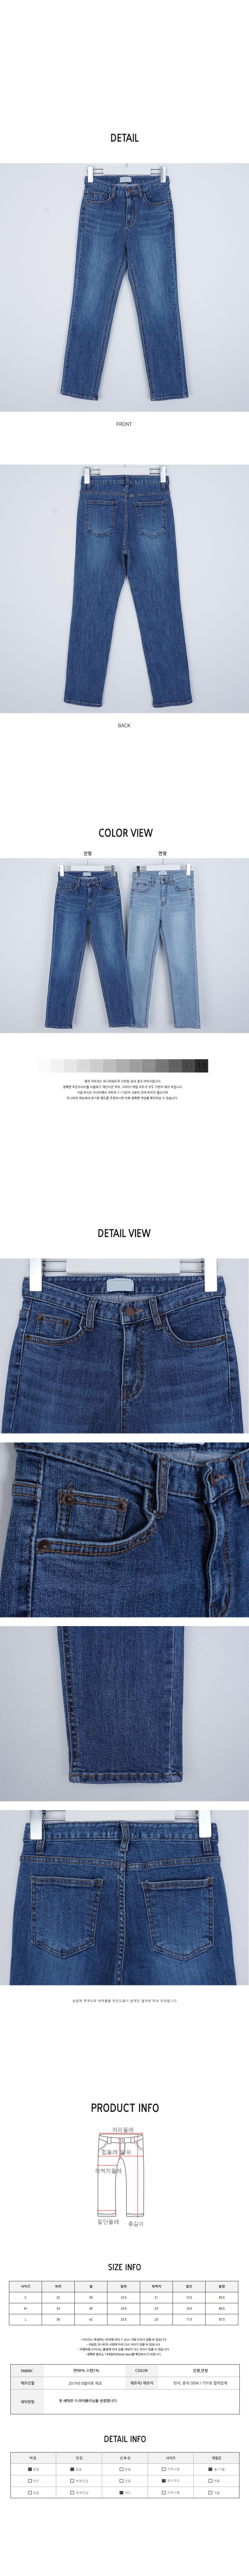 Cade slim jeans